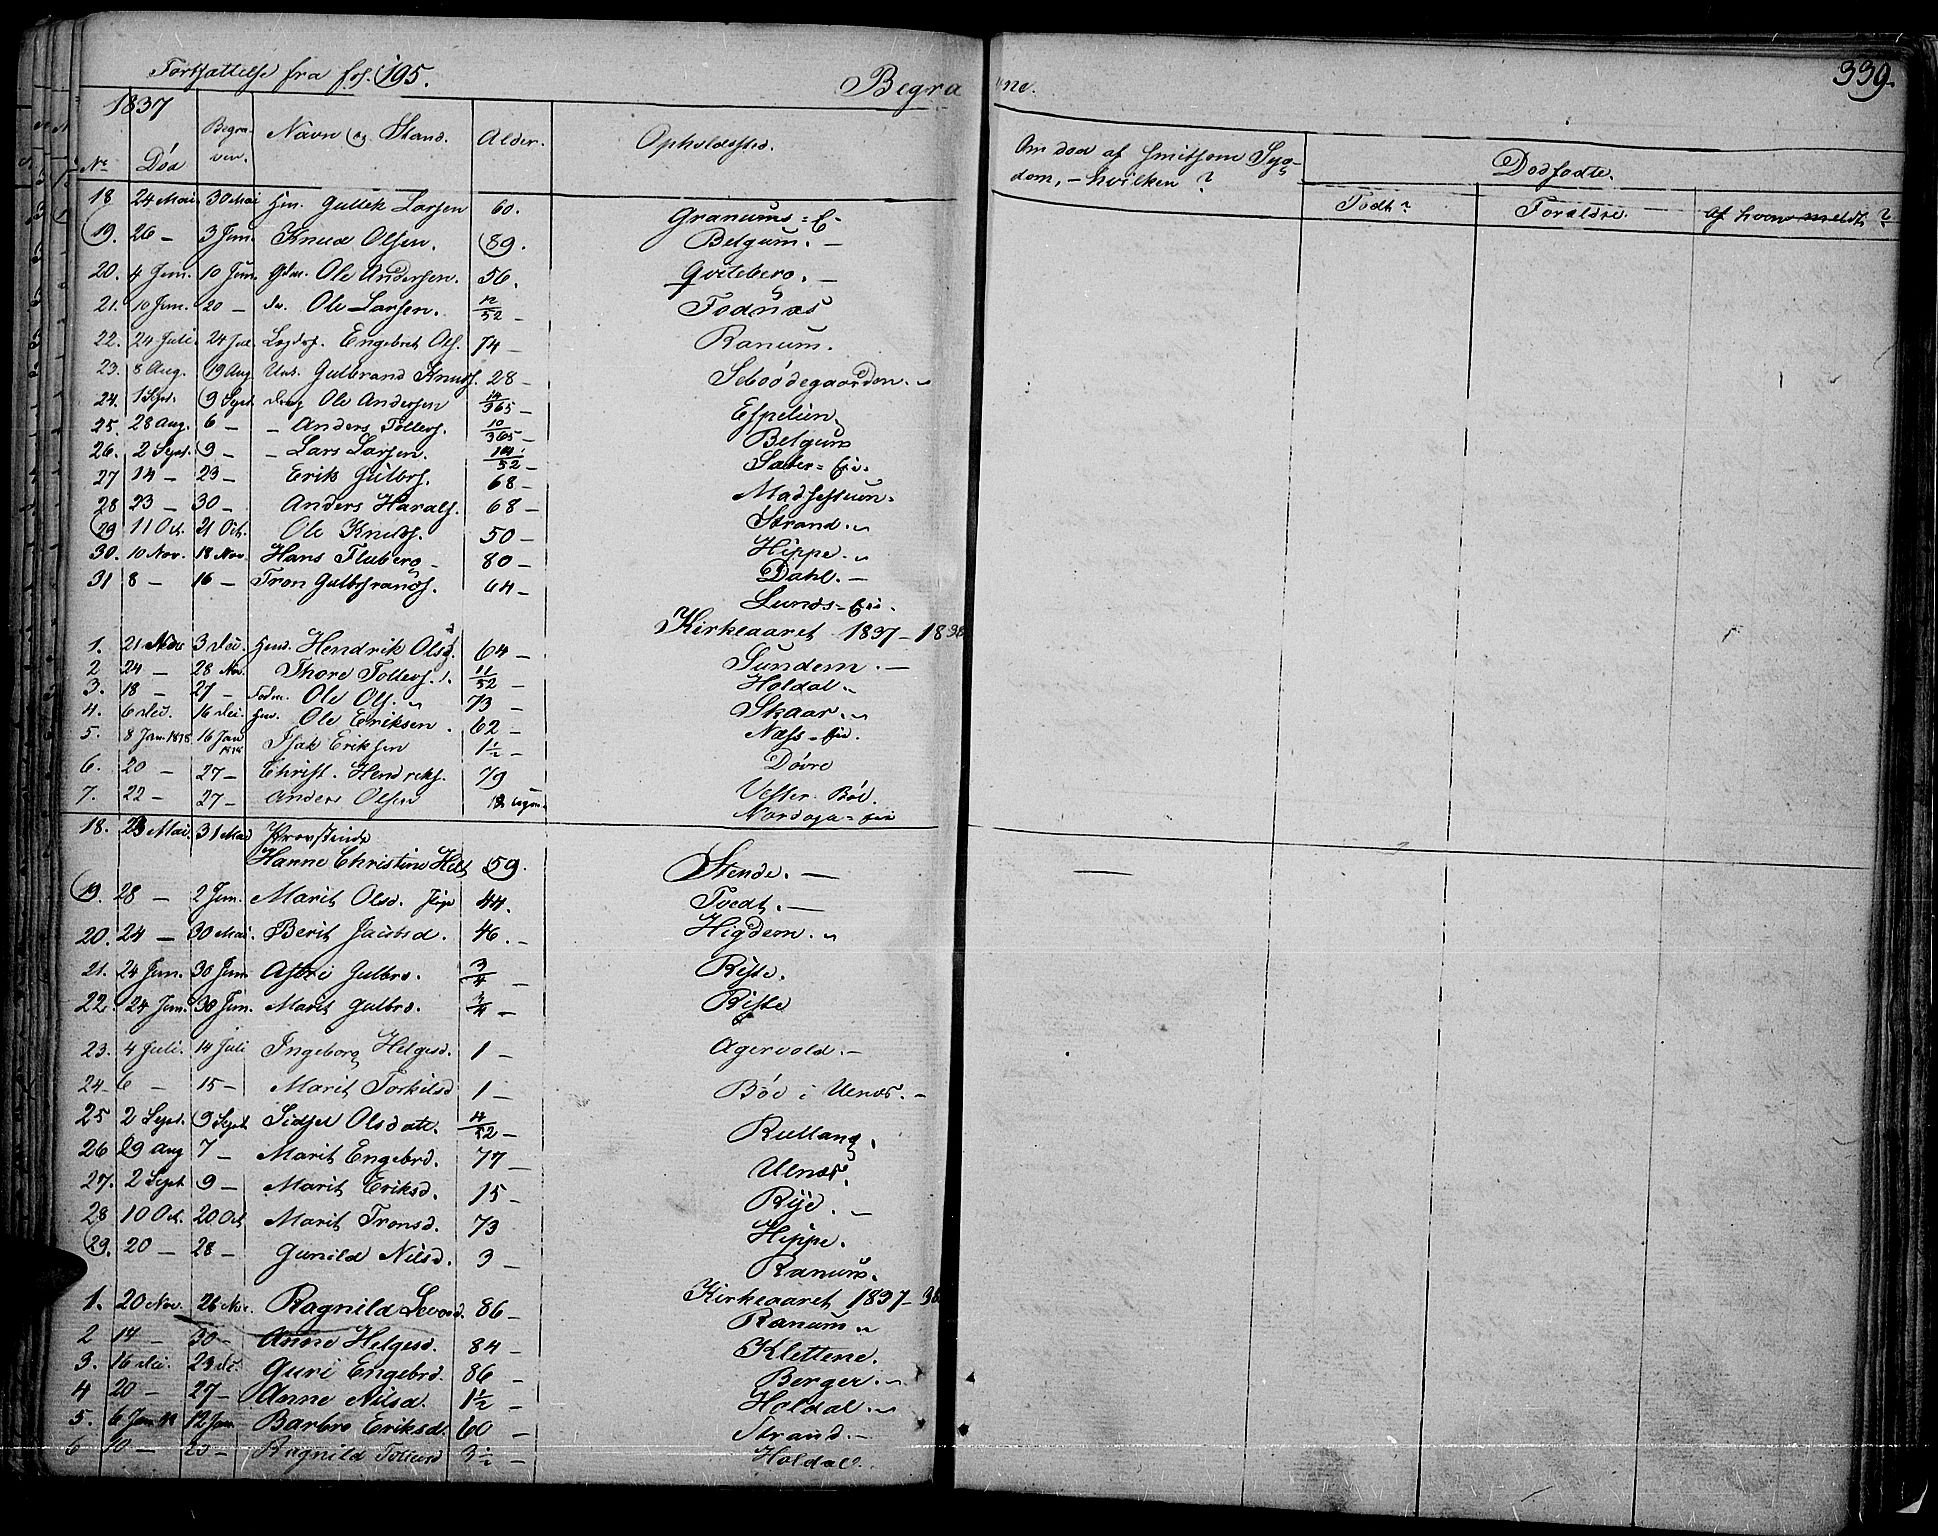 SAH, Nord-Aurdal prestekontor, Ministerialbok nr. 3, 1828-1841, s. 339